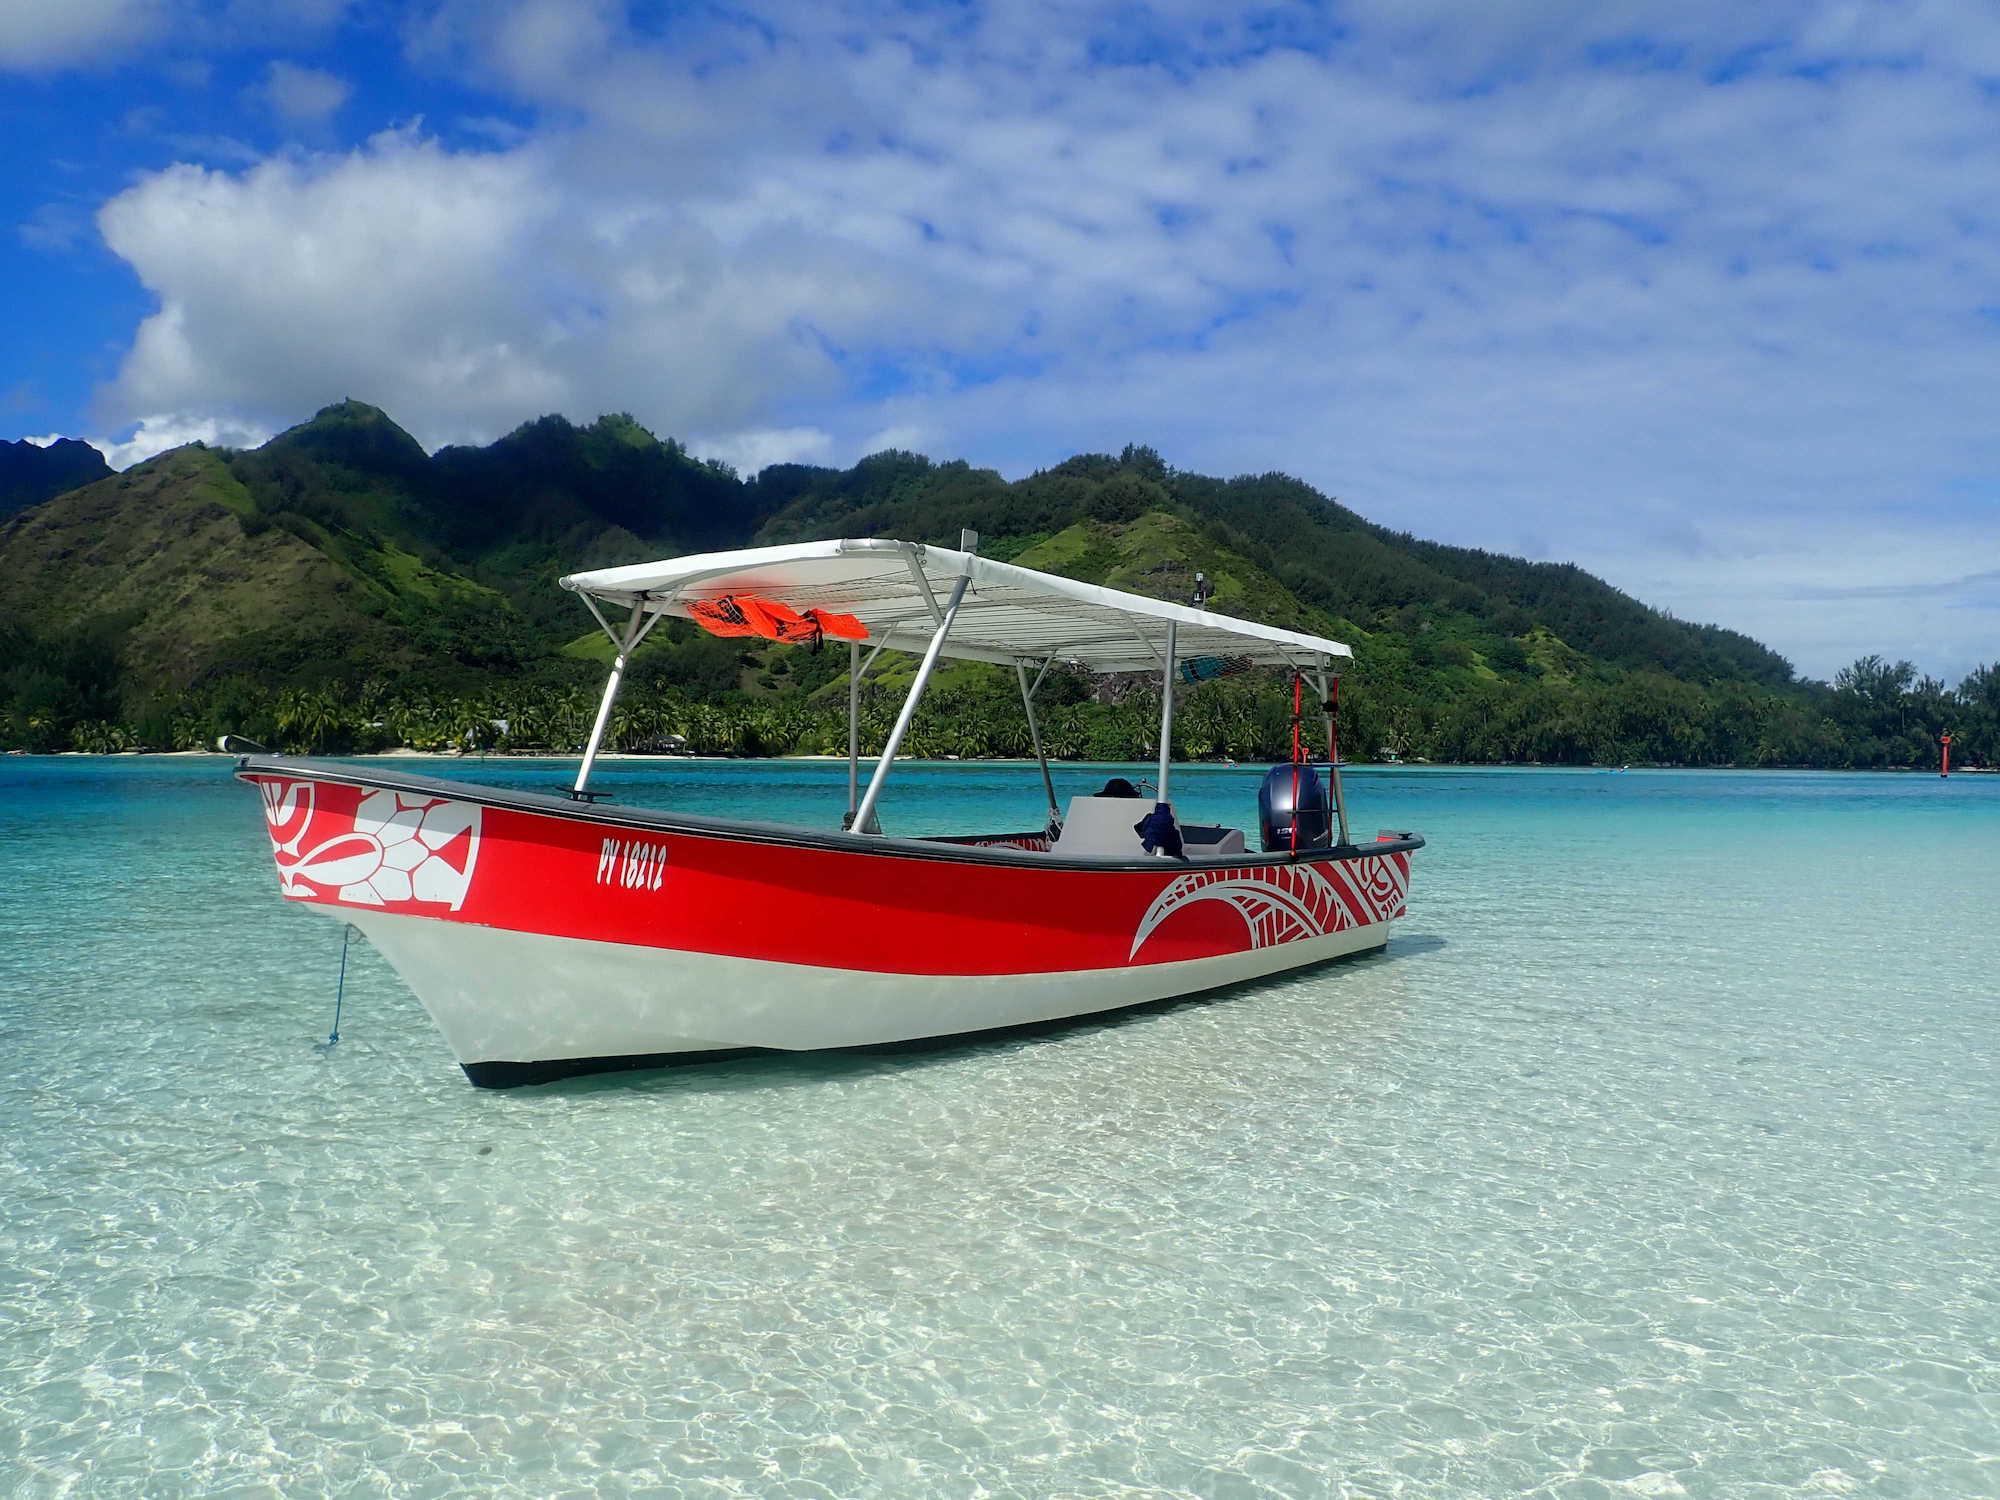 https://tahititourisme.mx/wp-content/uploads/2020/09/Boat-Hinaloa.jpg